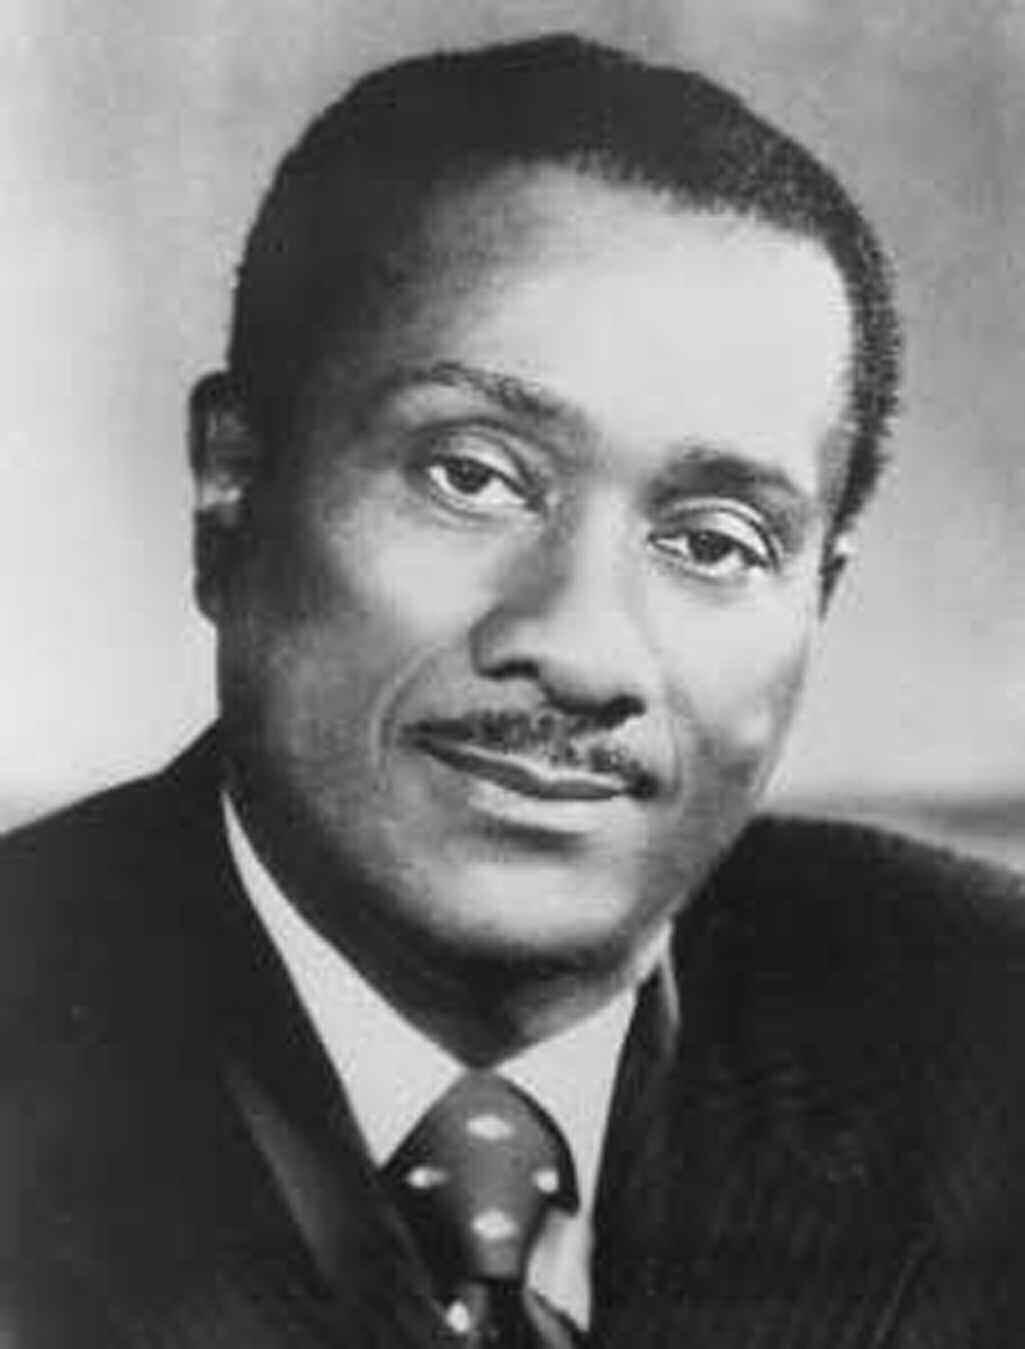 John H. Johnson, Founder of Jet and Ebony Magazines